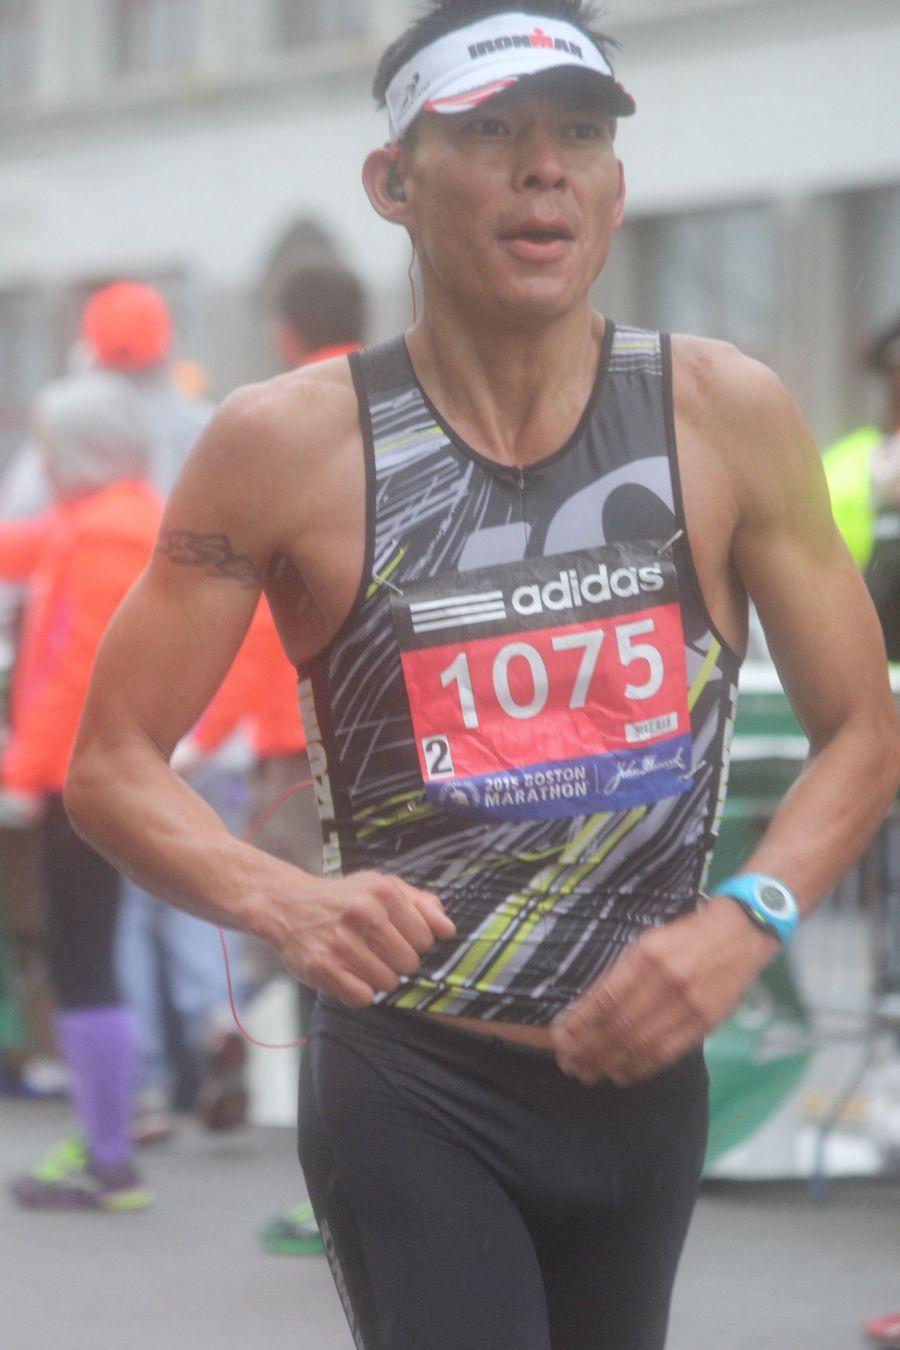 boston marathon april 20 2015 racer number 1075